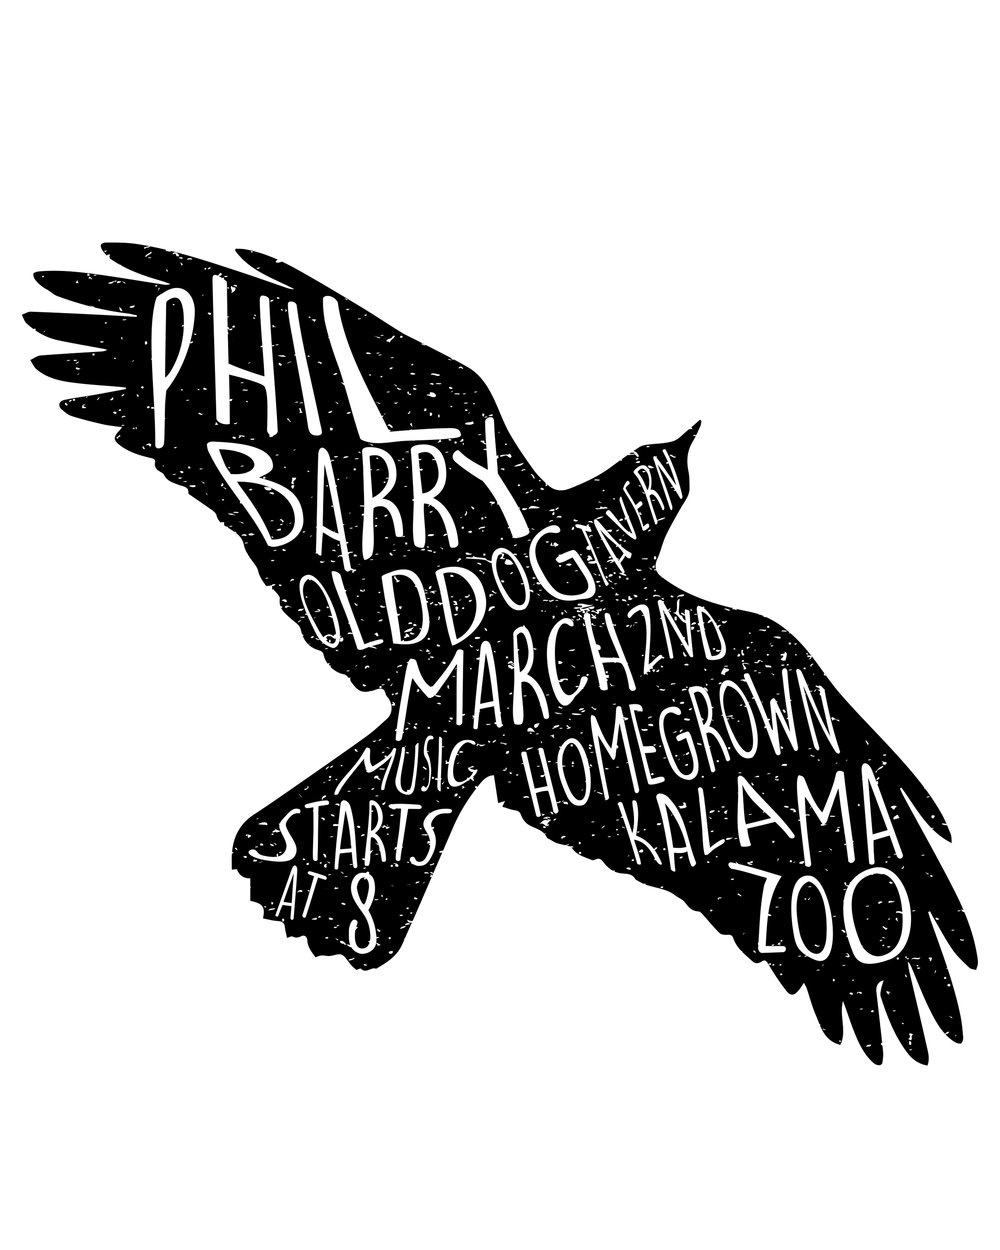 philbarry.jpg